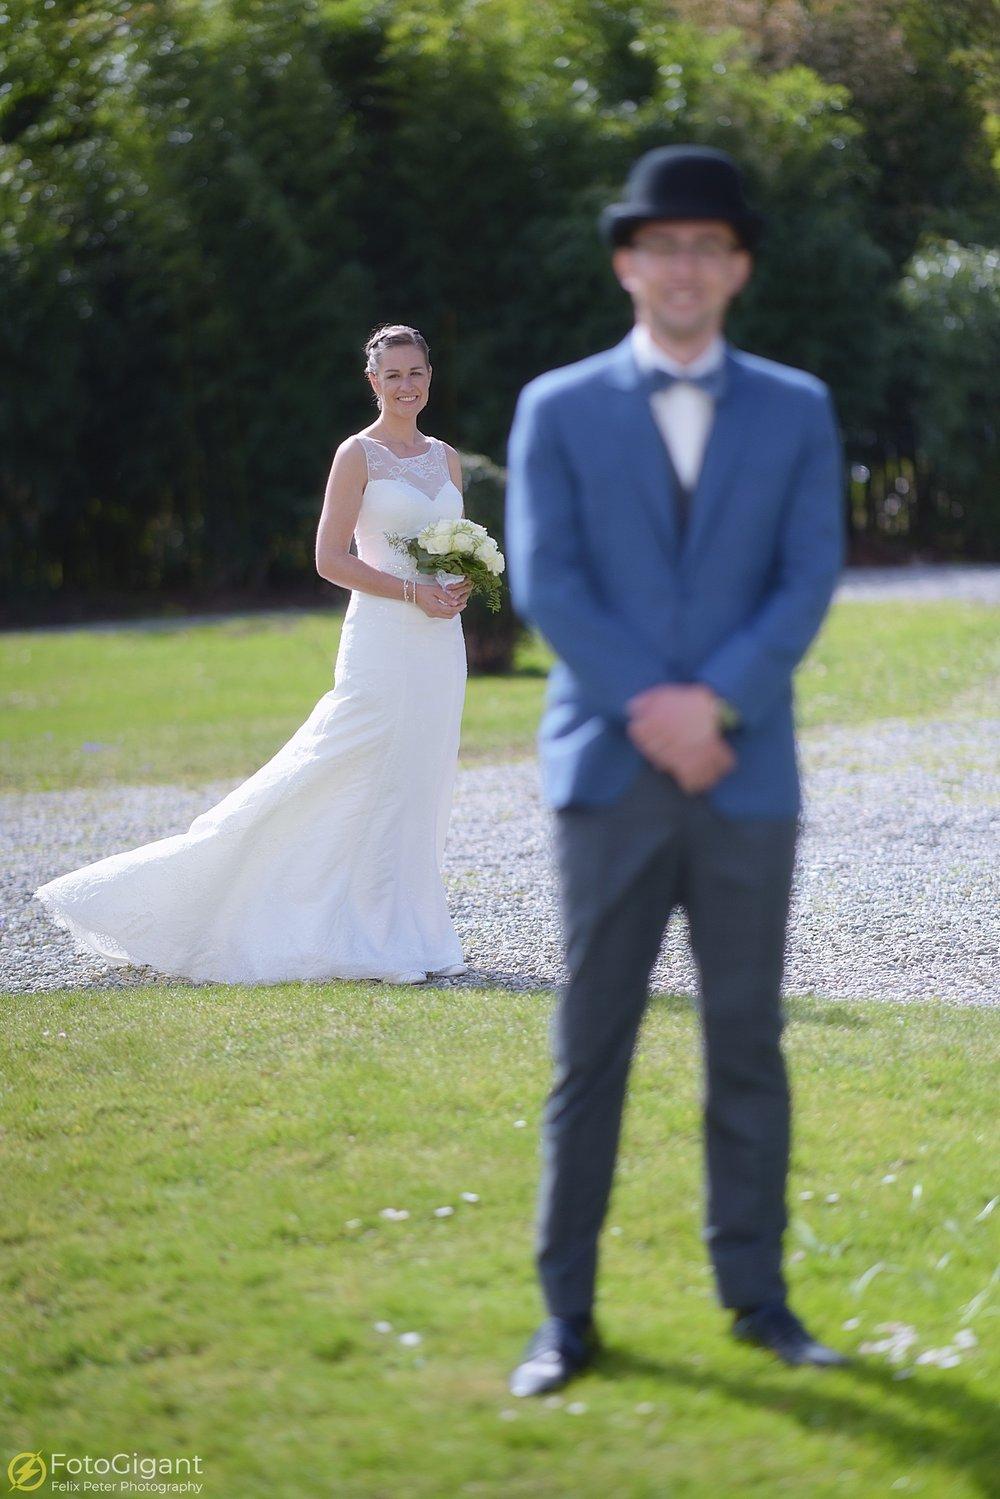 Hochzeitsfotografiekurs_Fotograf_Felix_Peter_14.jpg